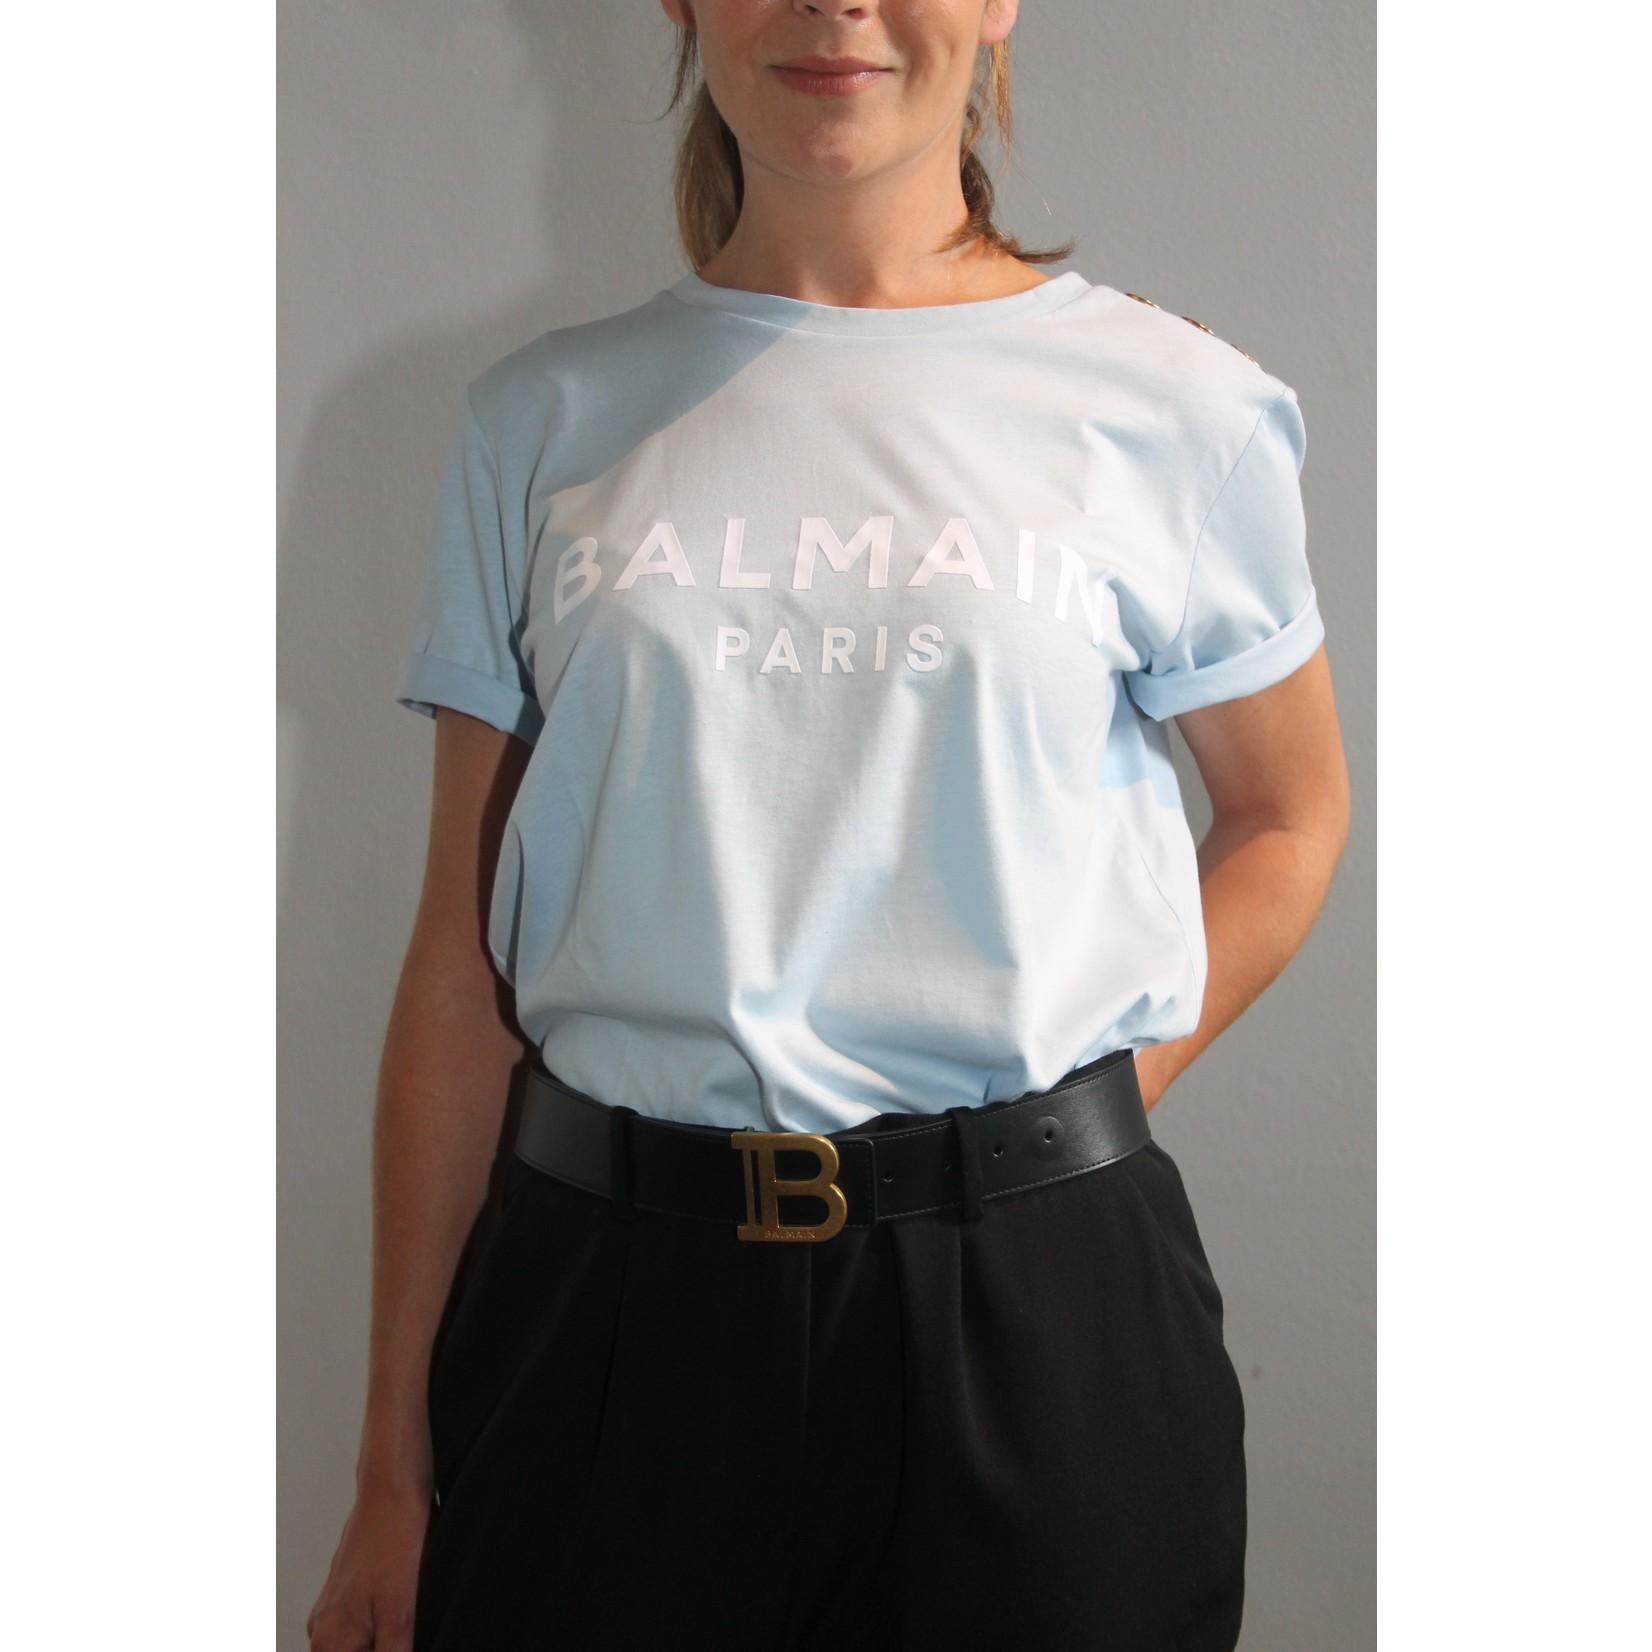 BALMAIN T-Shirt 42579